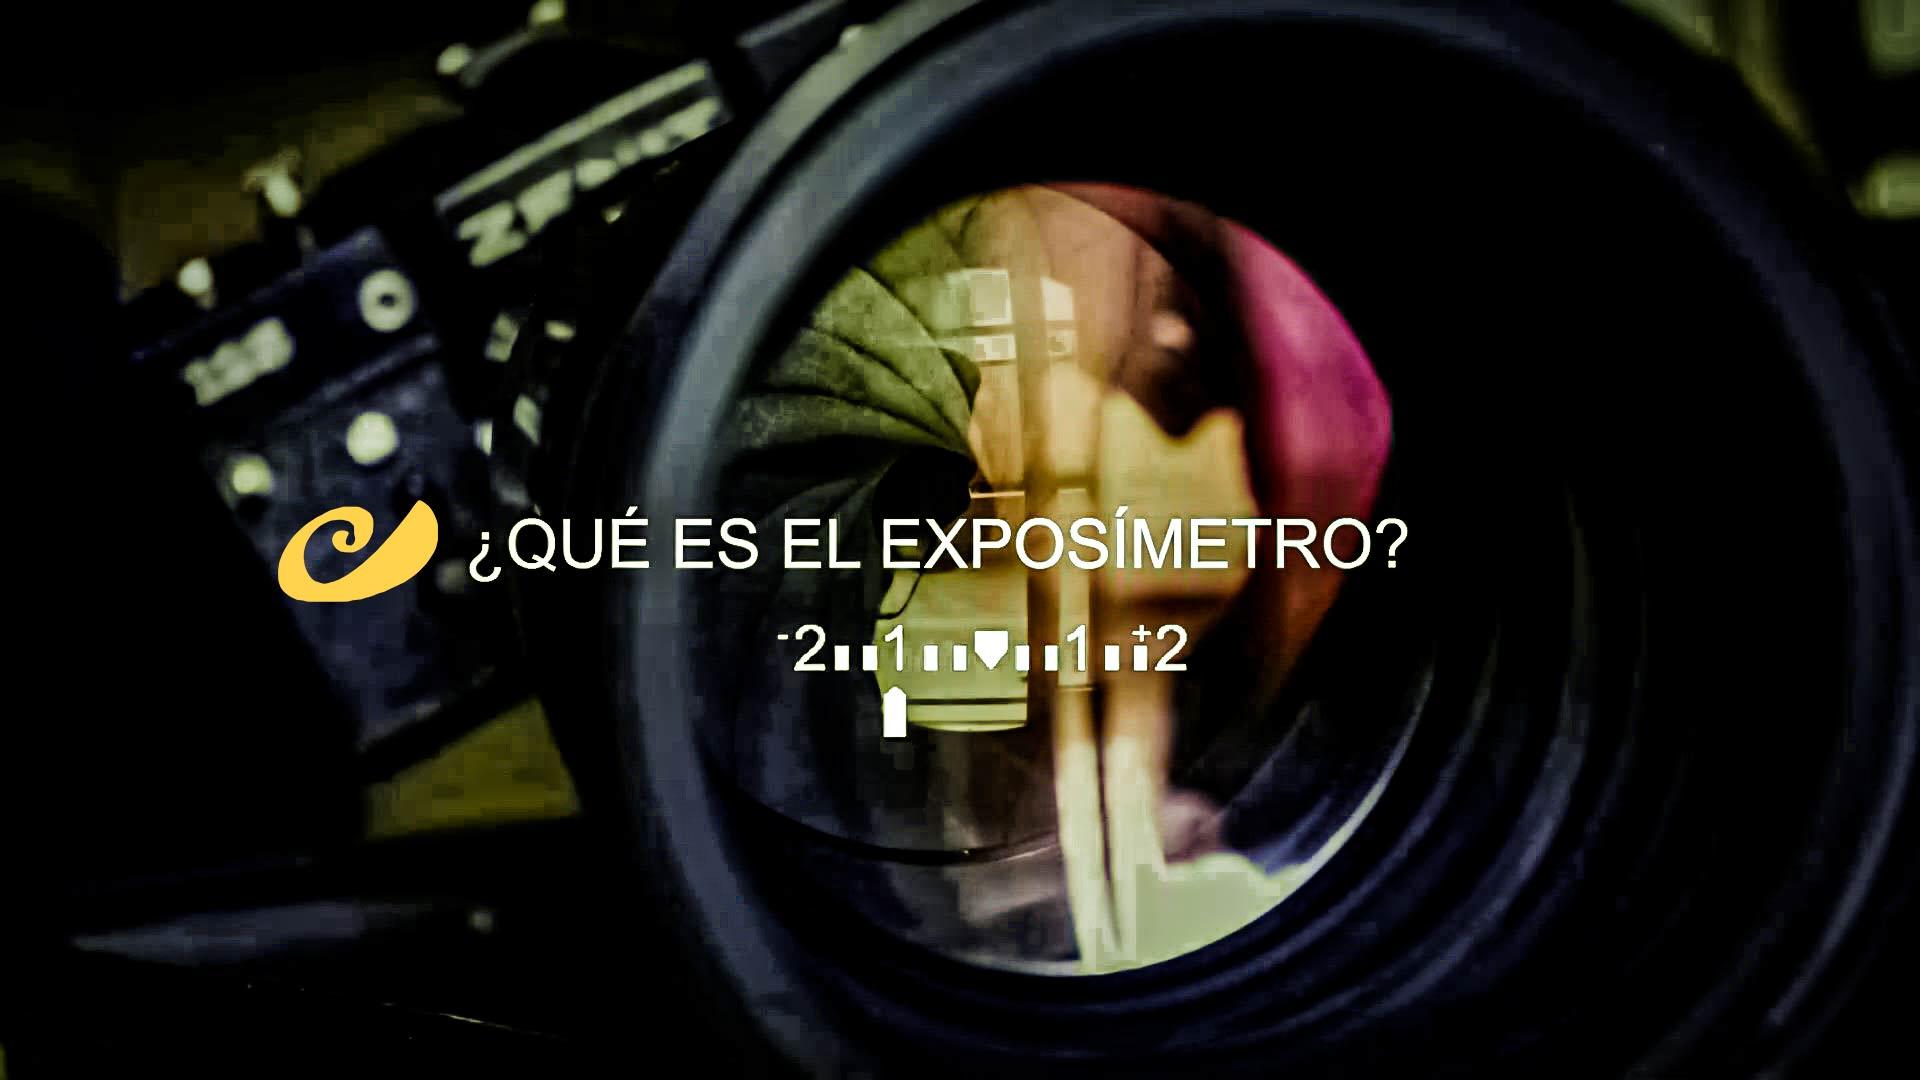 EL EXPOSÍMETRO